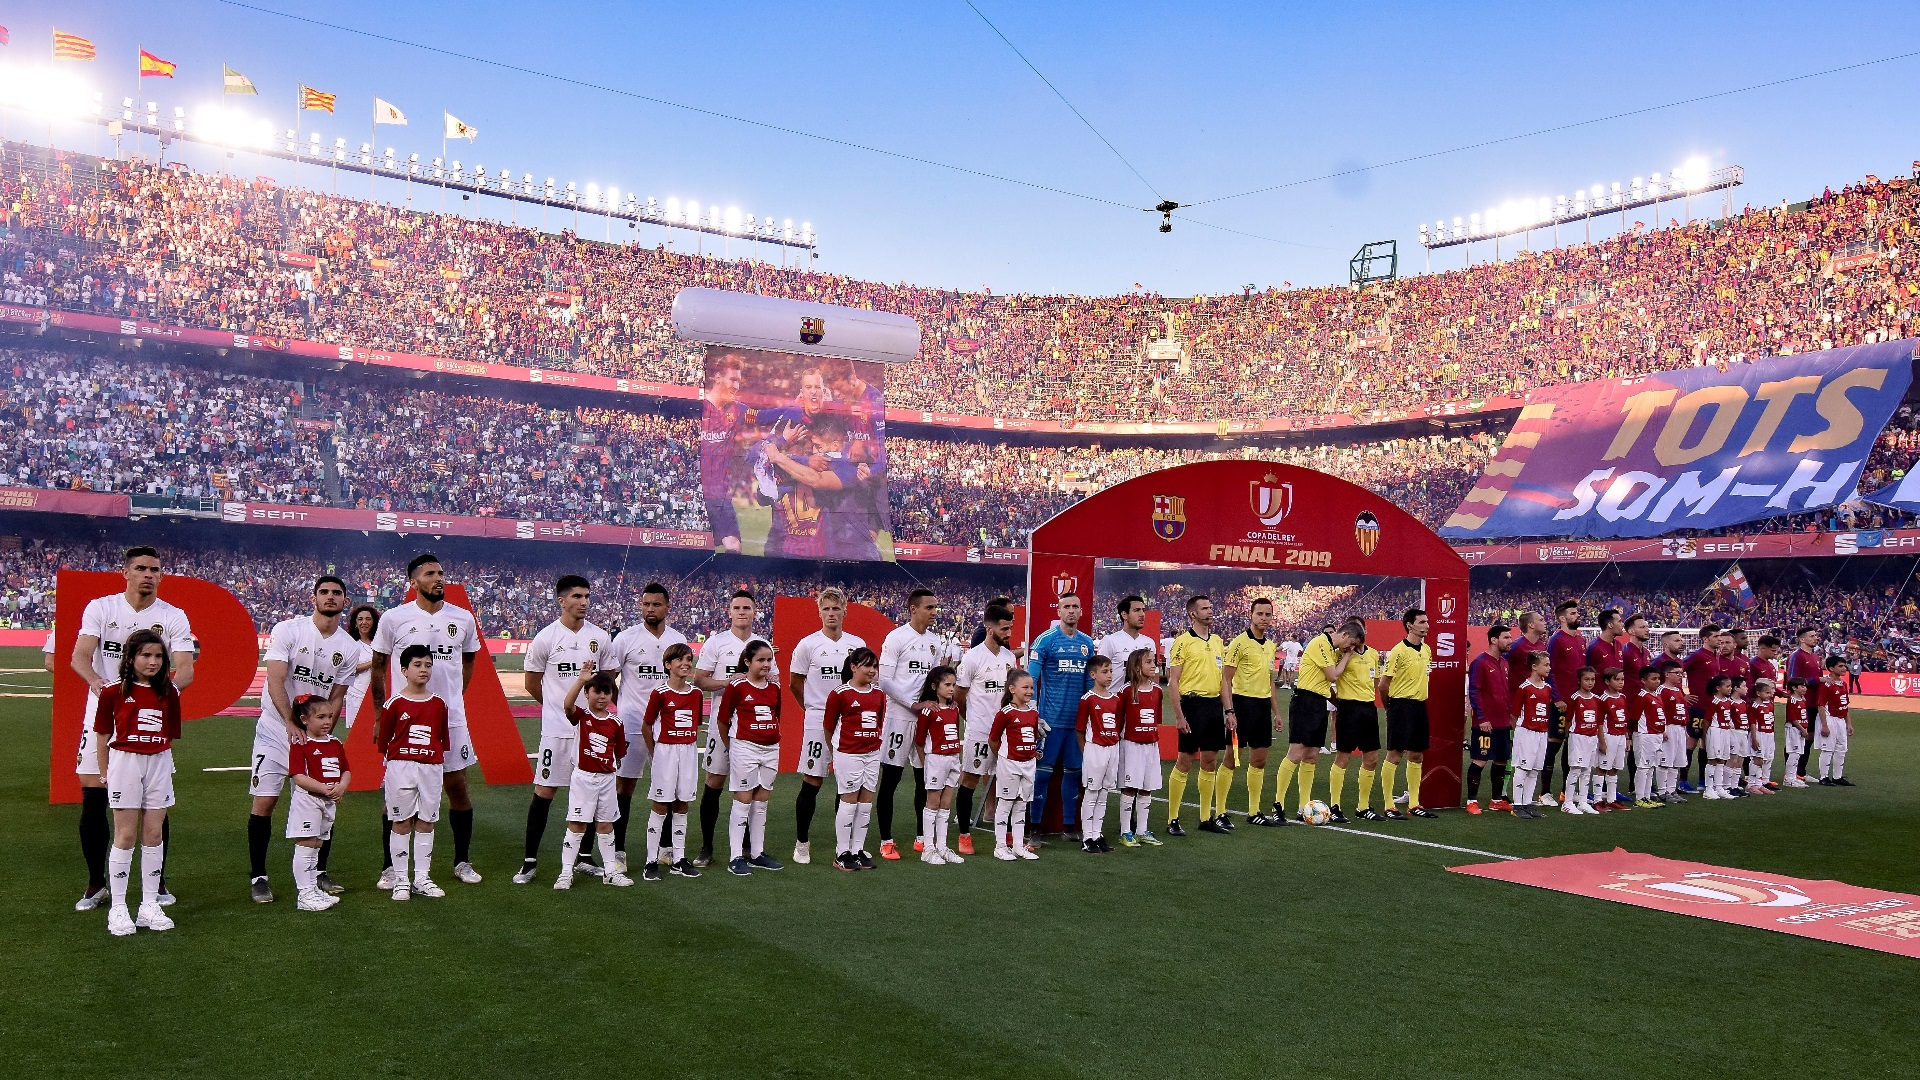 Futbol - Final Copa del Rey 2019 - F.C. Barcelona - Valencia C.F. ...